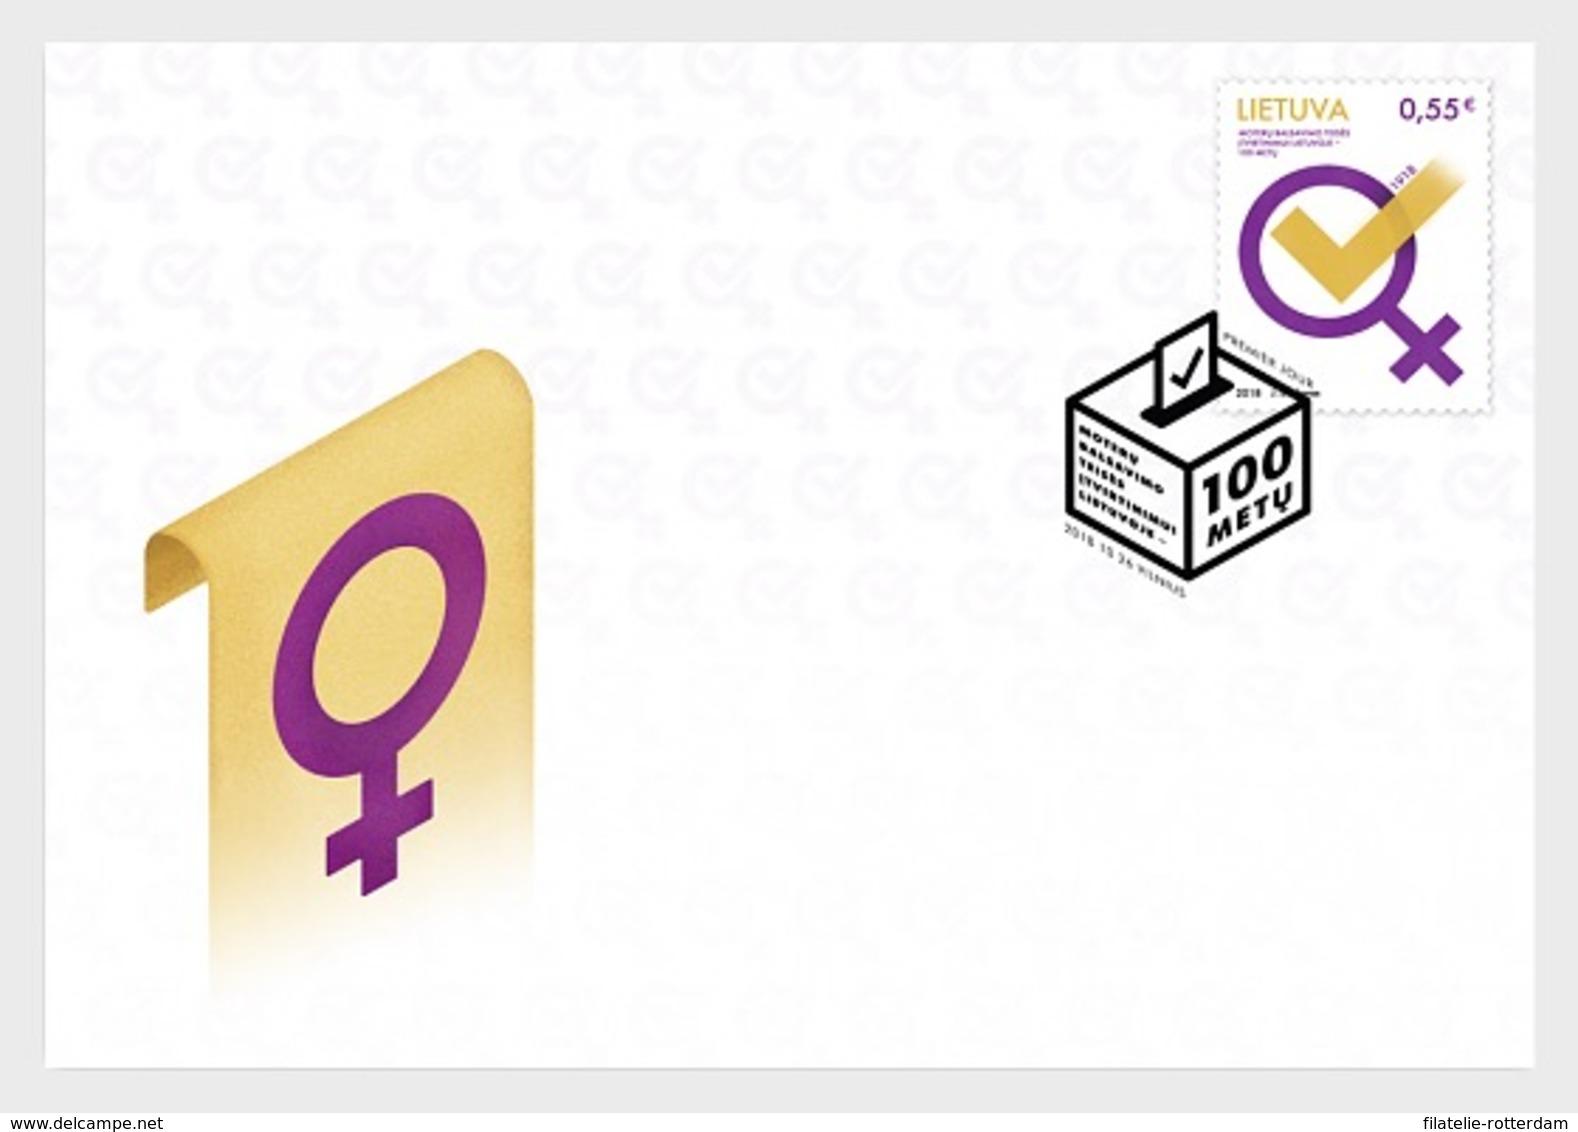 Litouwen / Lithuania - Postfris / MNH - FDC Vrouwenrechten 2018 - Lithuania